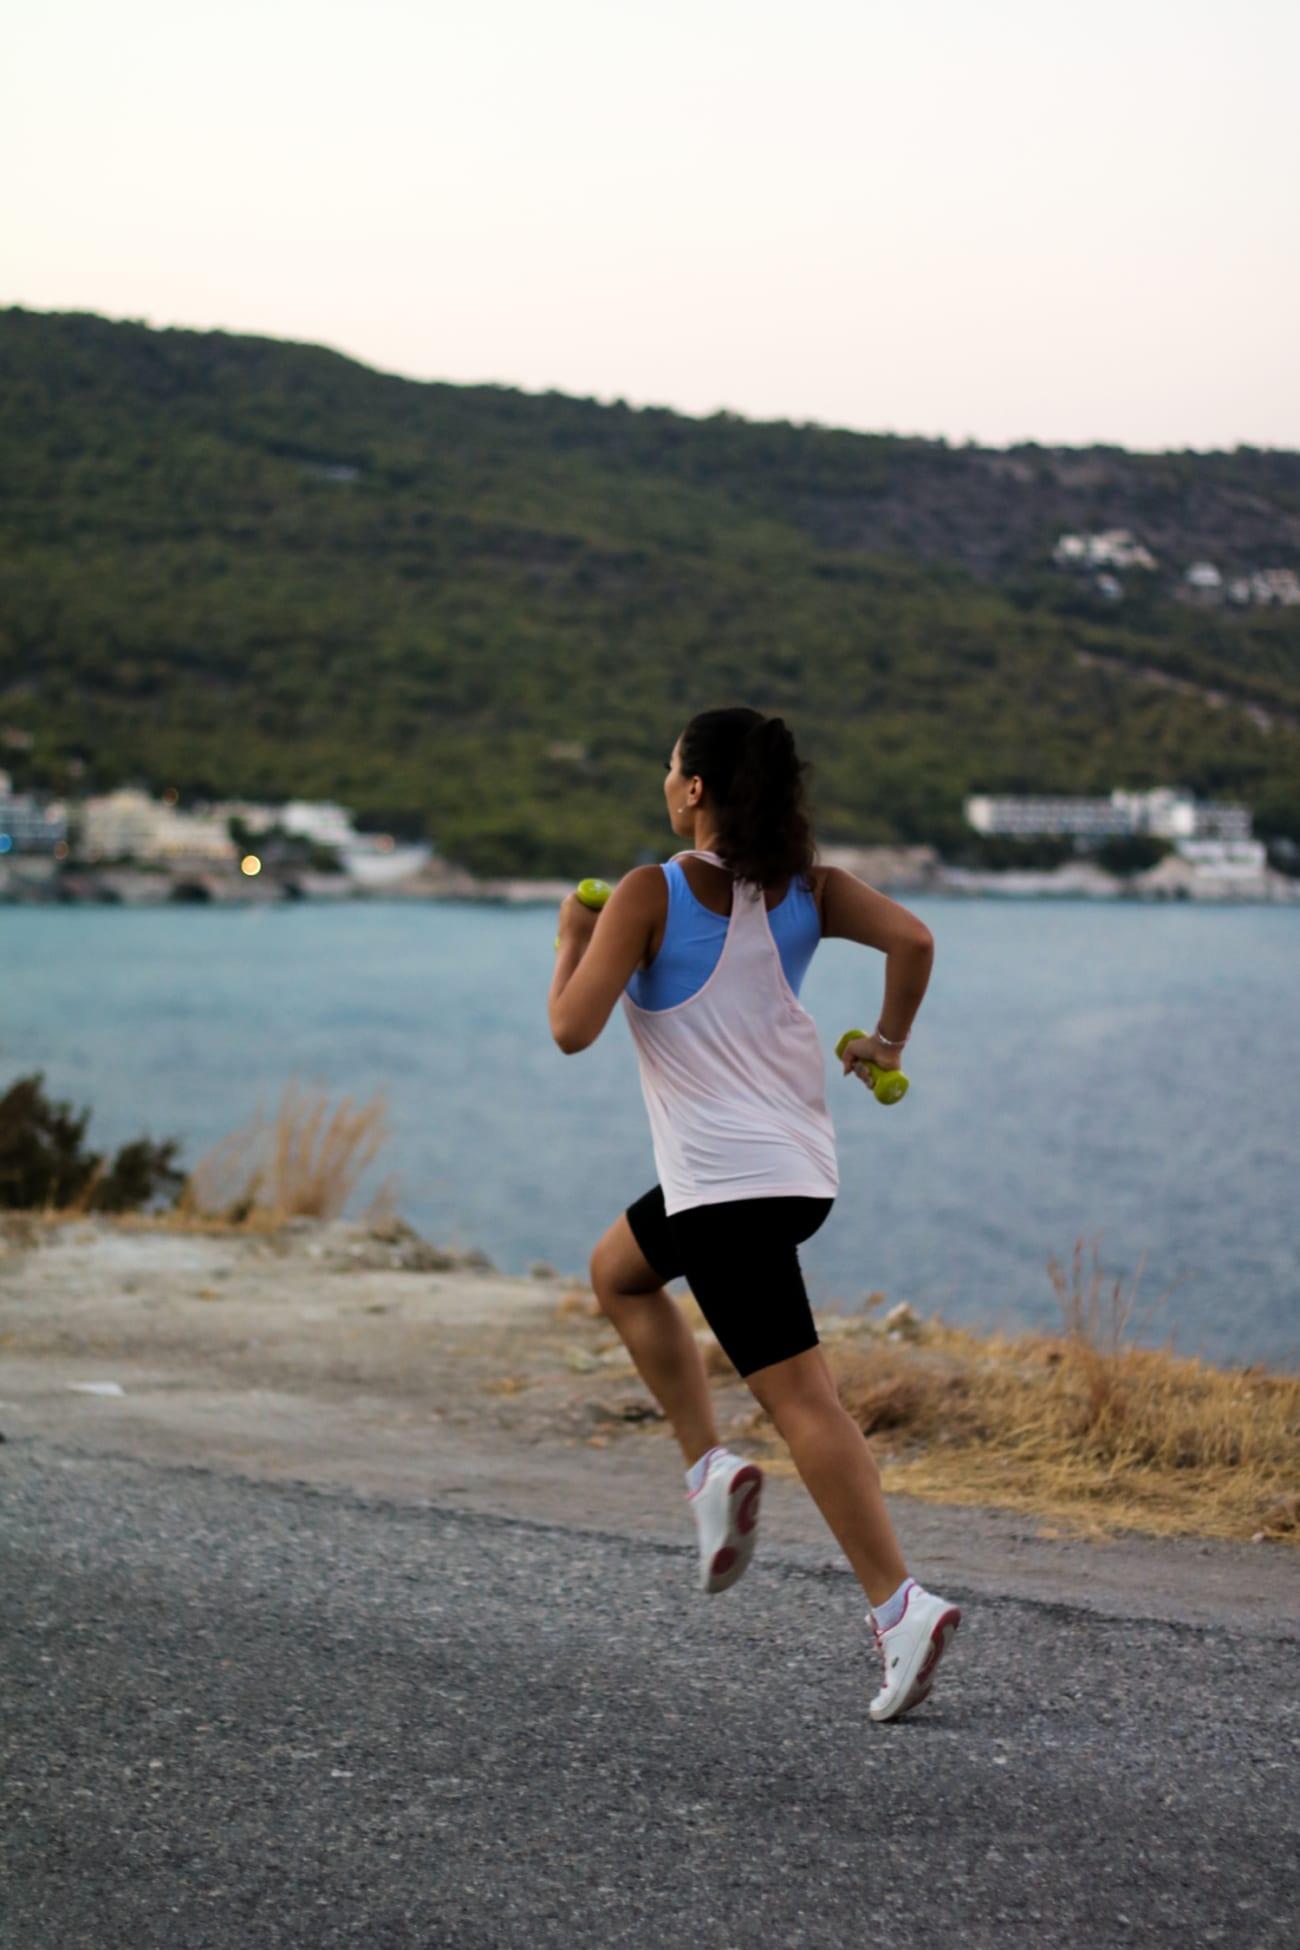 gain muscles sa te apuci de sala sa ma apuc schimbare stil de viata how to start aerobics exercise change lifestyle sport workout